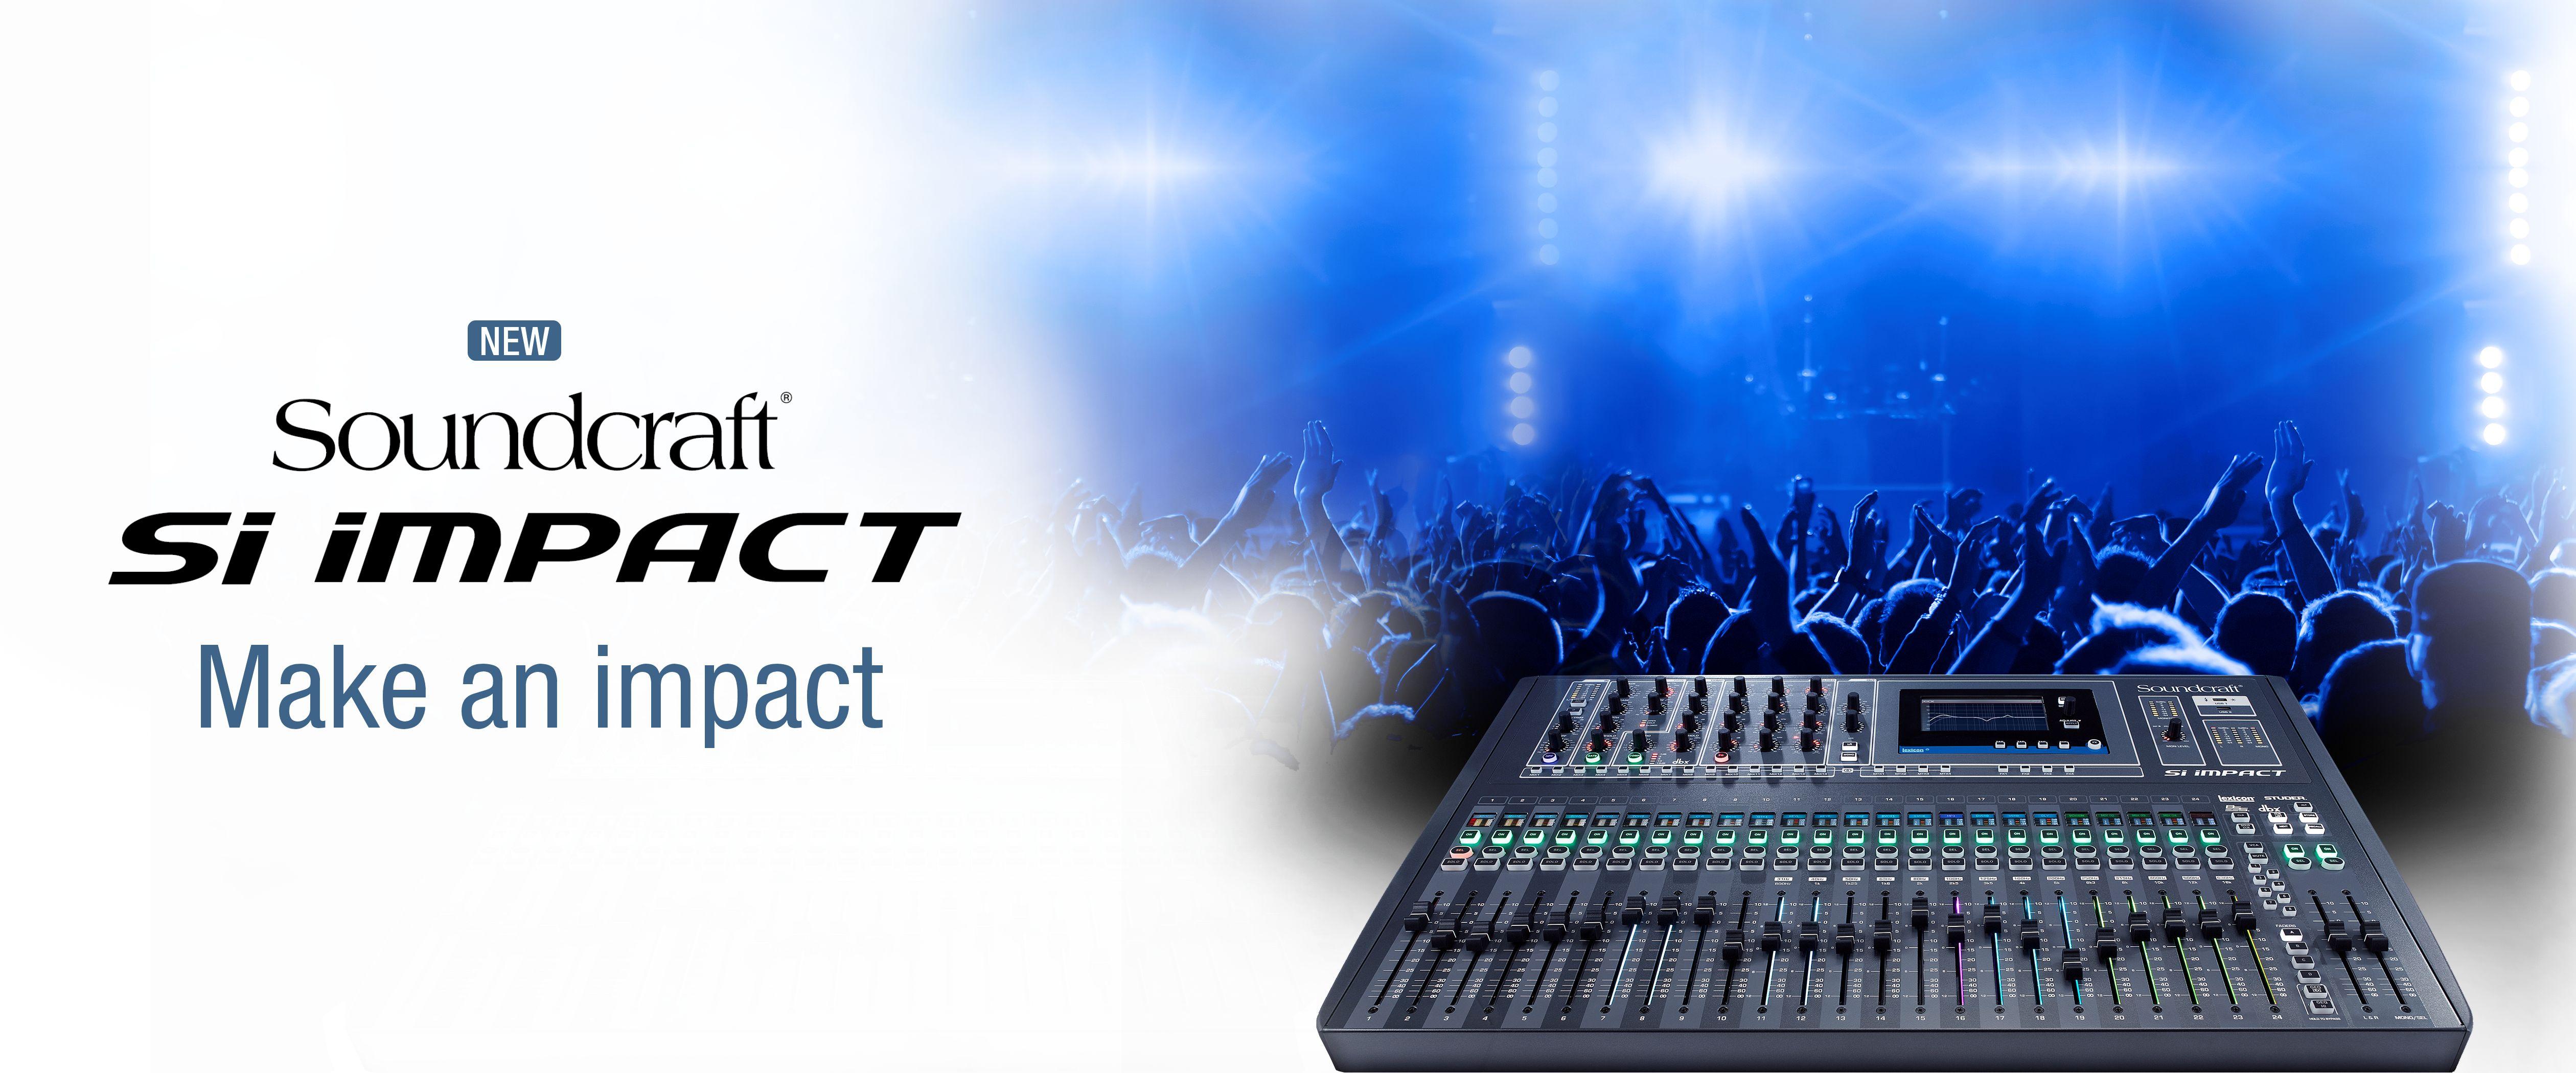 10042016/News/20410171233-si-impact.jpg